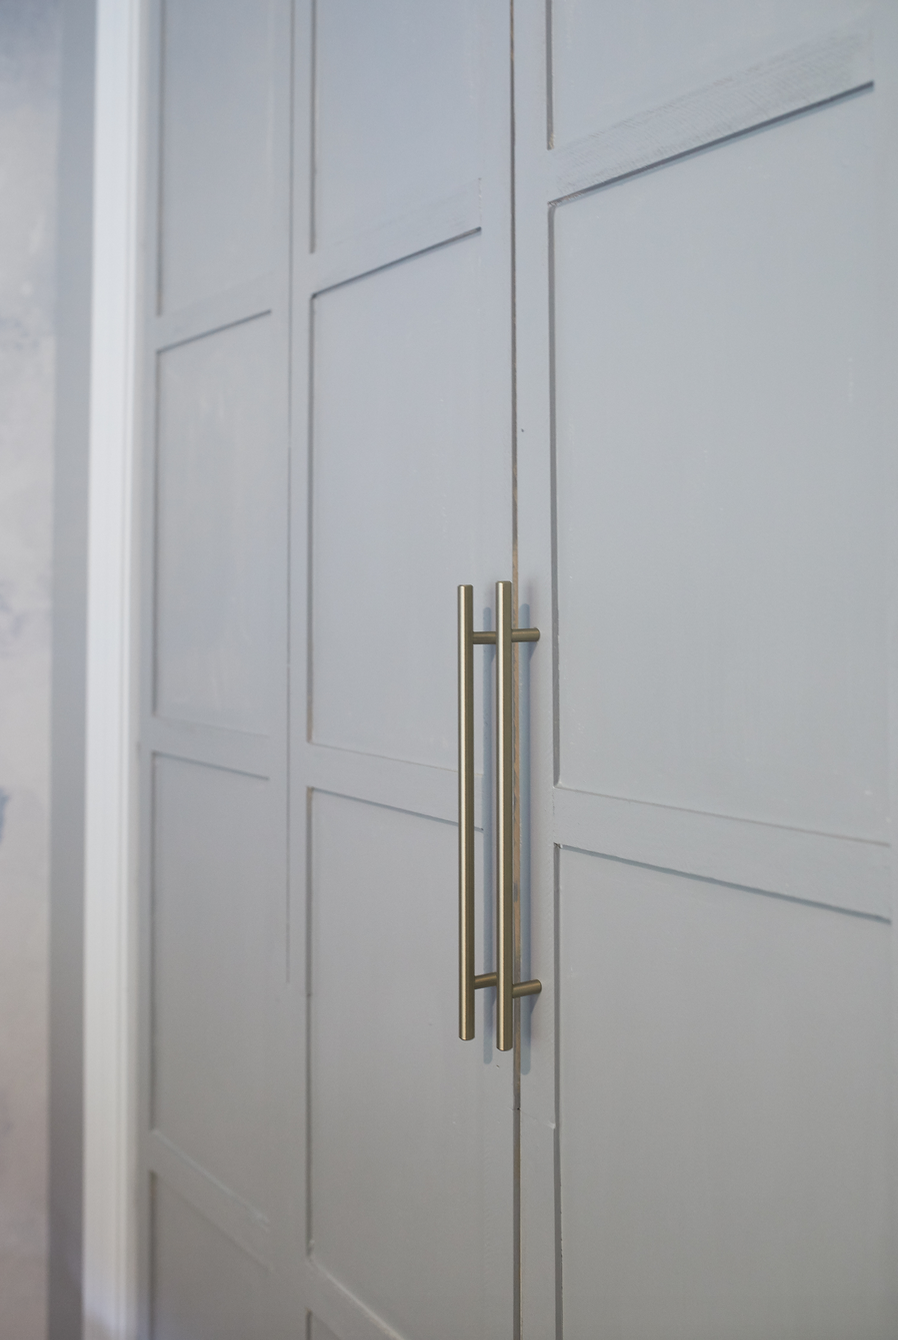 Updated Closet doors with hardware